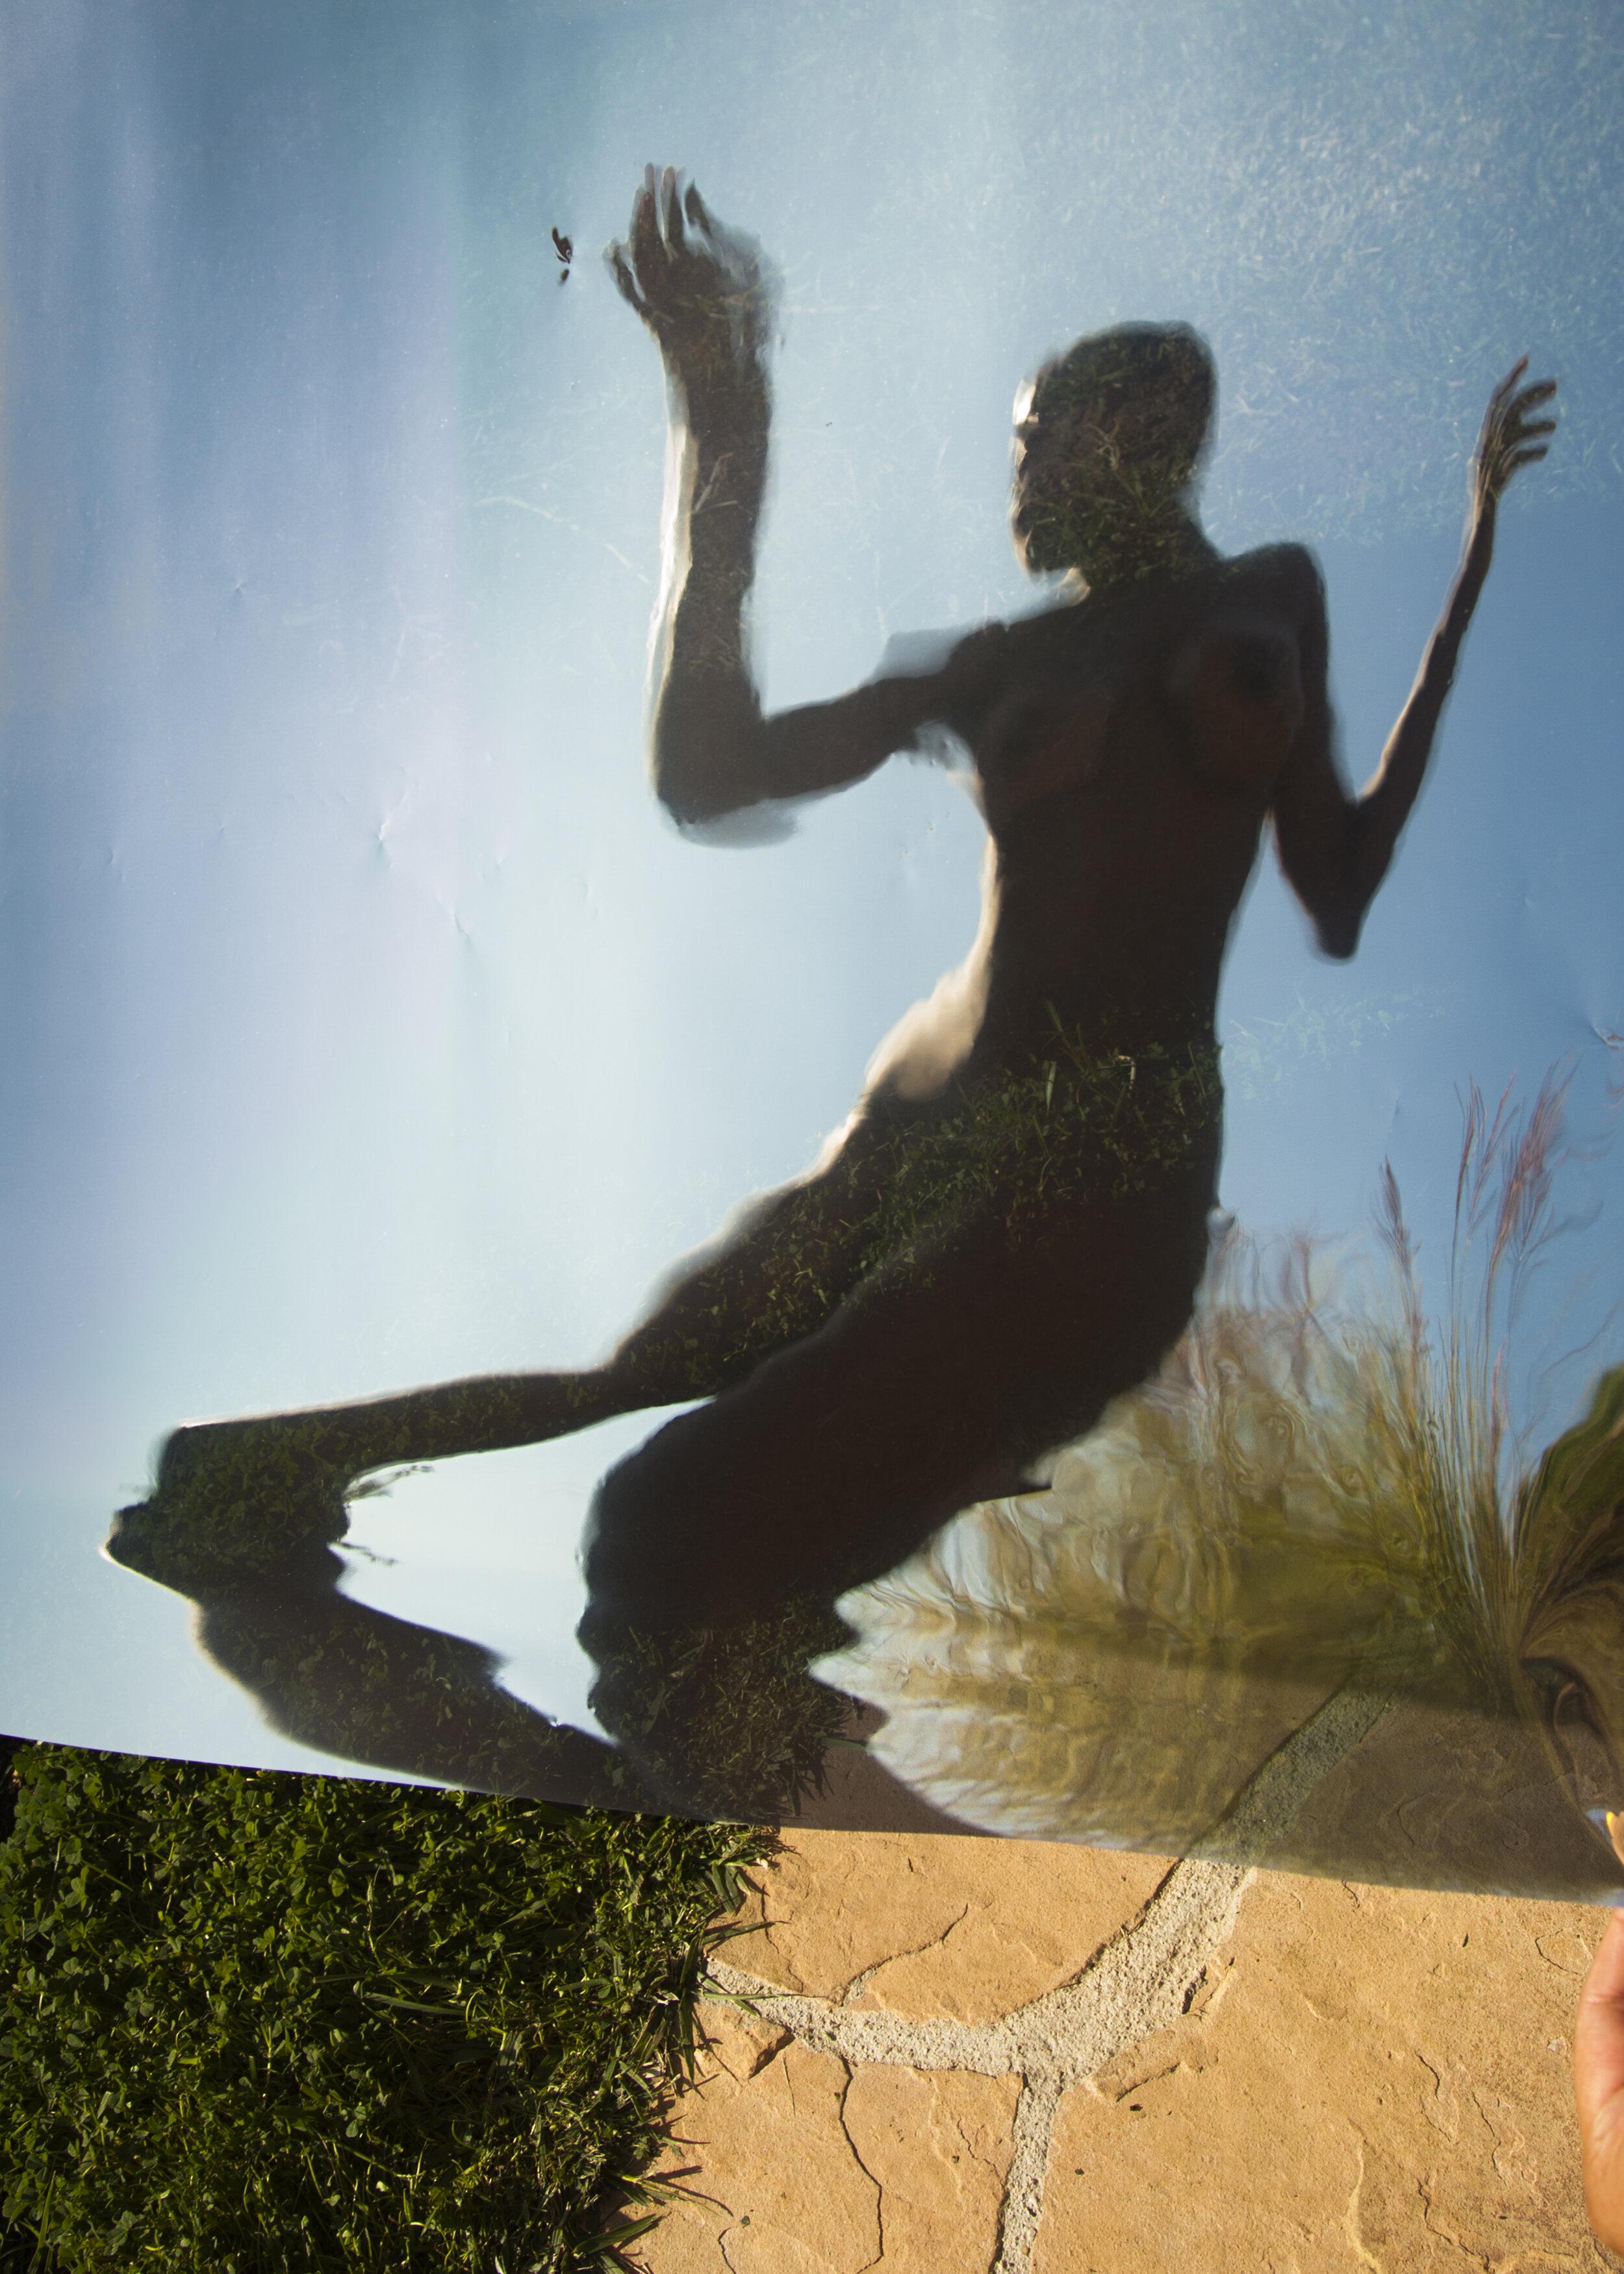 Body Reflexion , L.A. 05, Gyclee print, Variable sizes, 2011